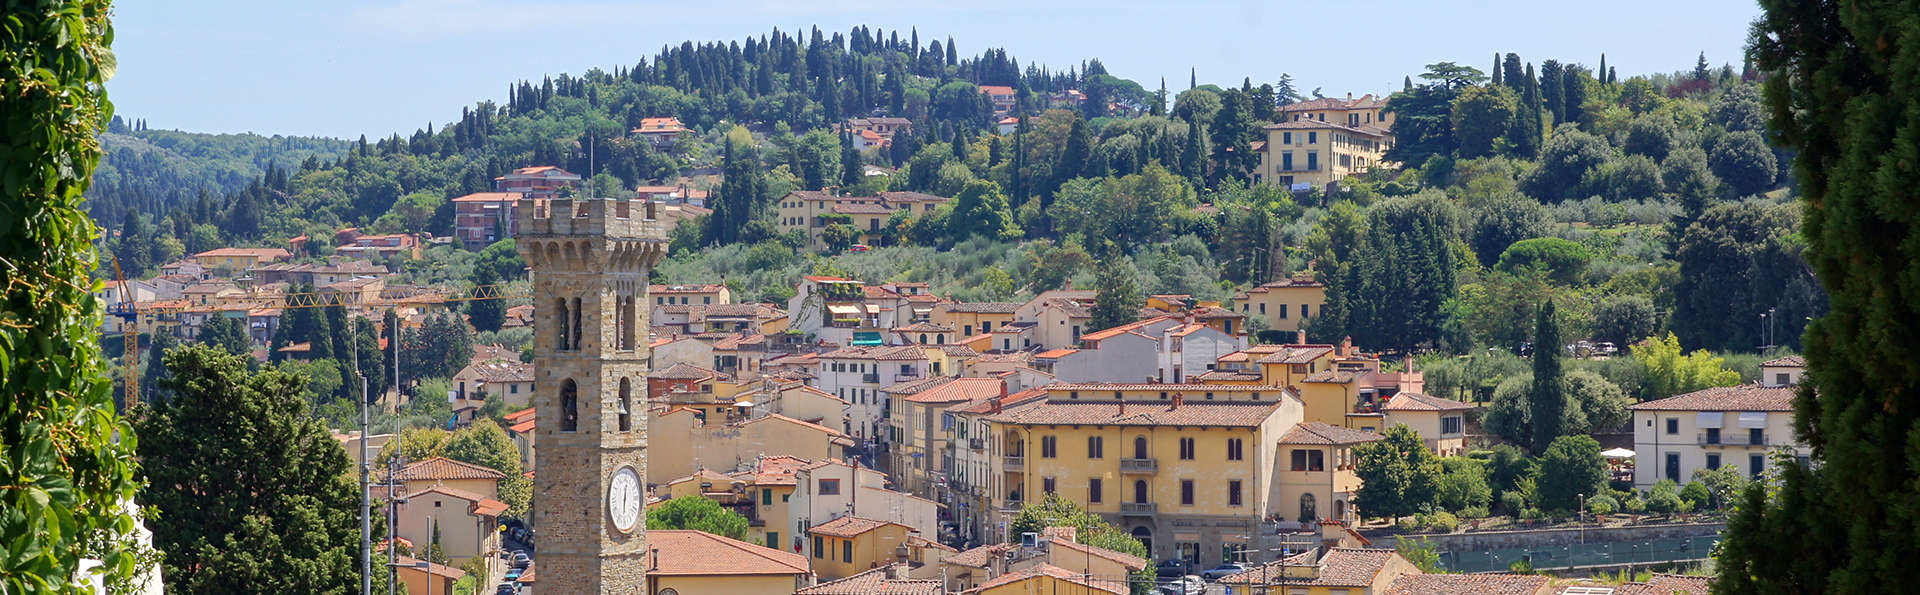 Villa Dei Bosconi - edit_Fotolia_61179654_fiesole.jpg